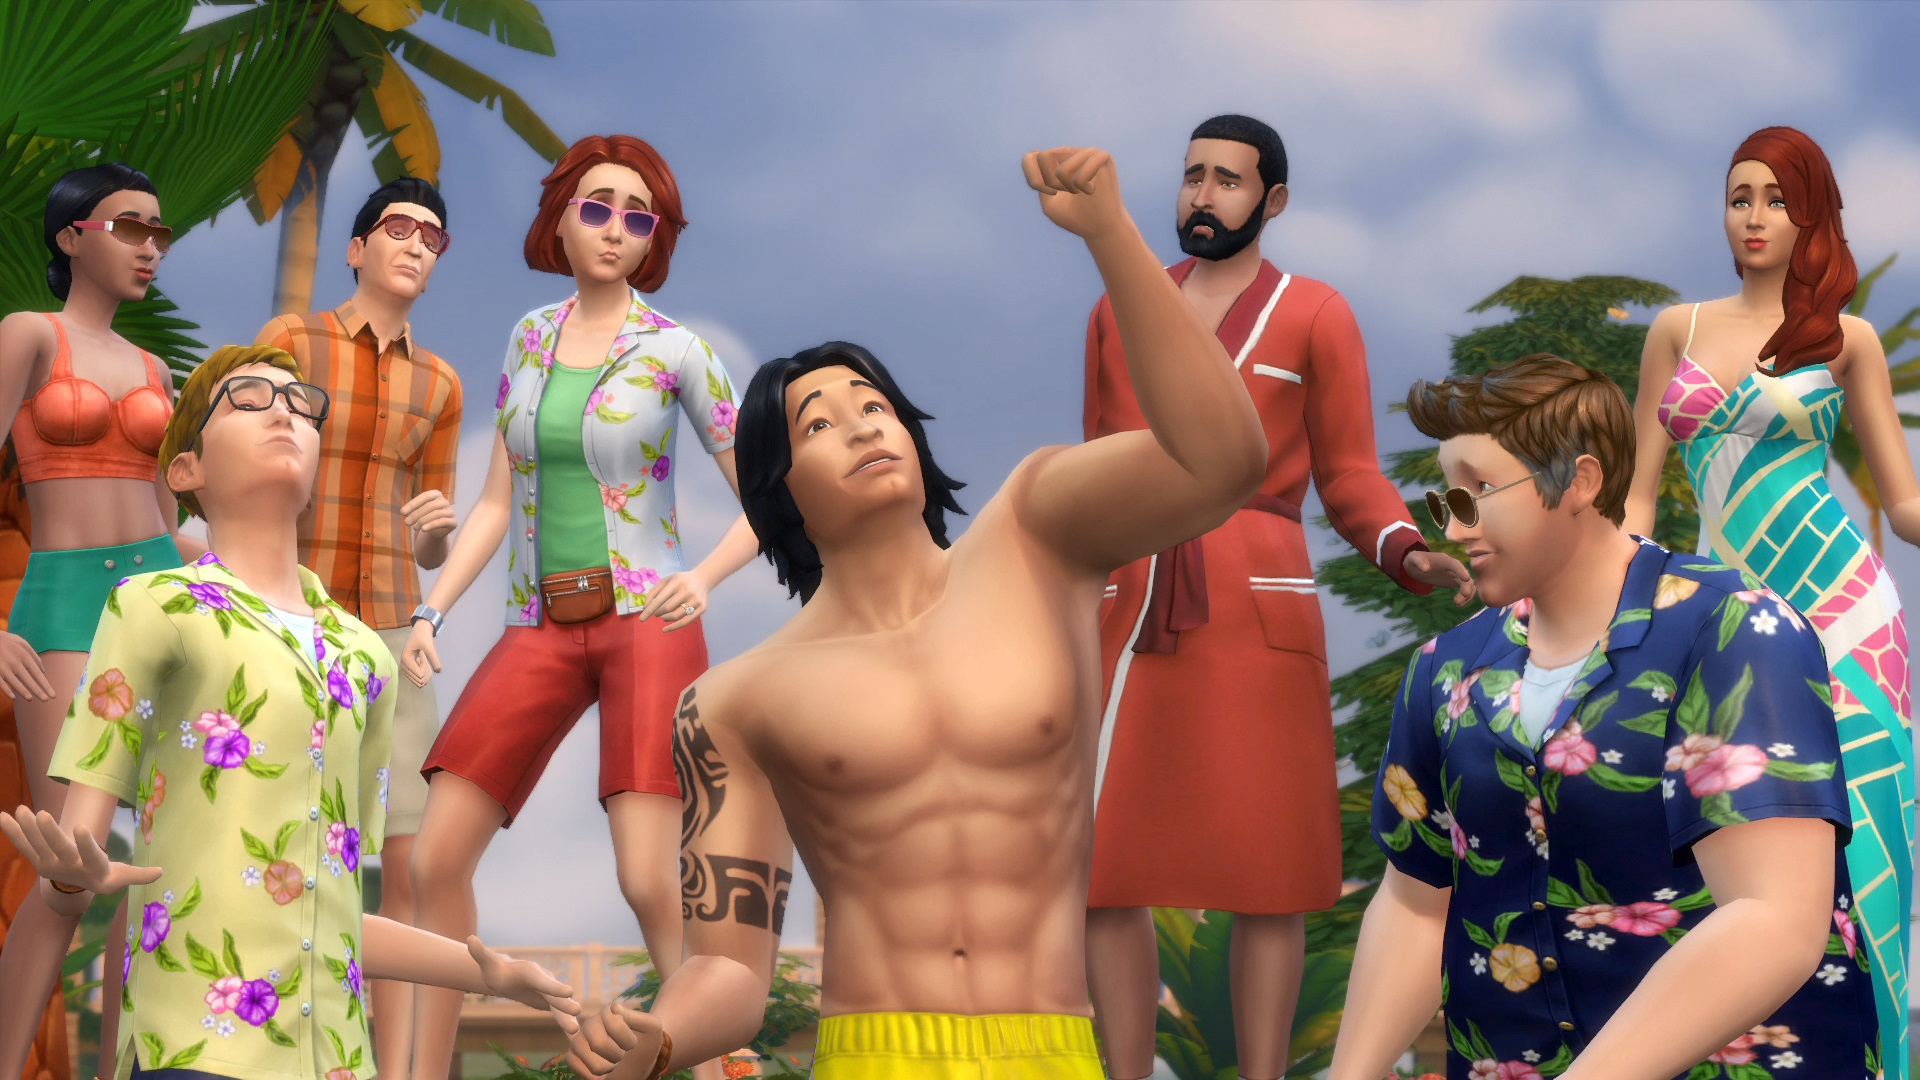 Sims 4 nagie porno pics